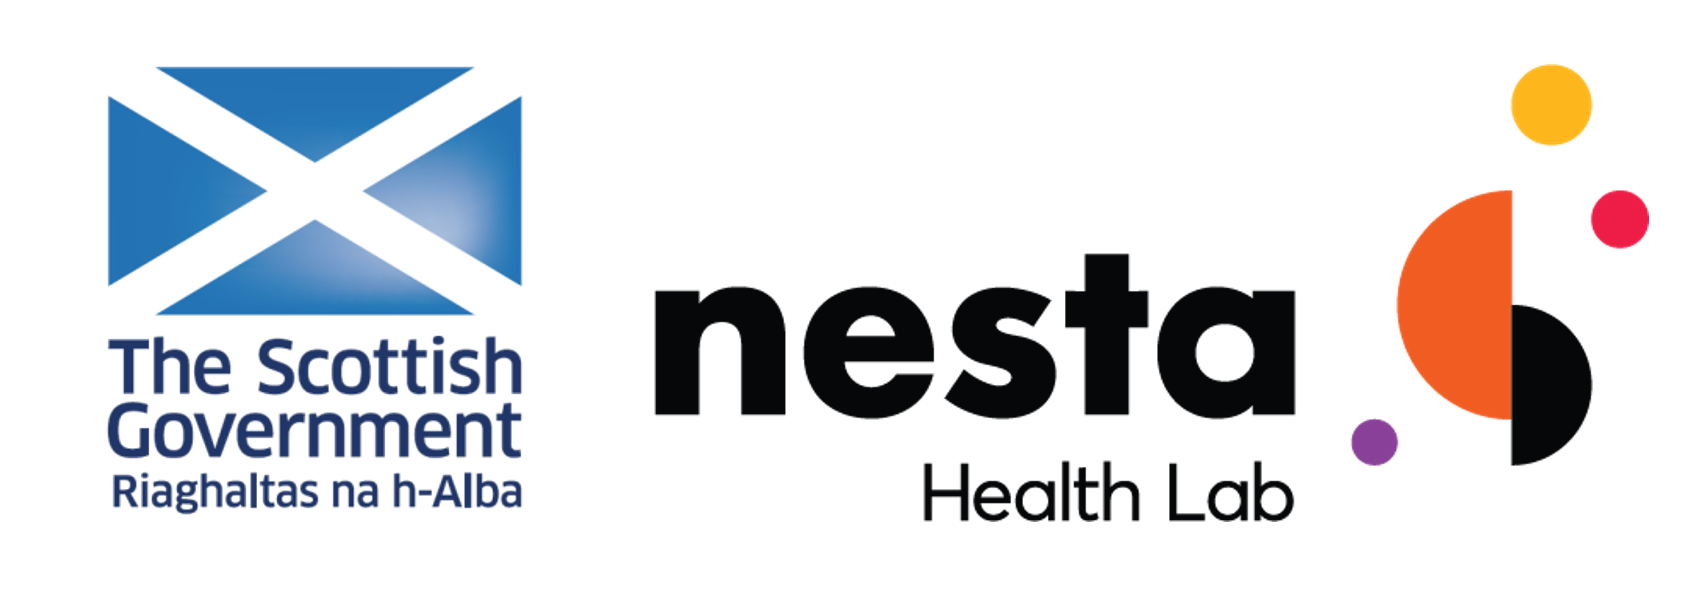 Scottish Government and nesta Health Lab logos